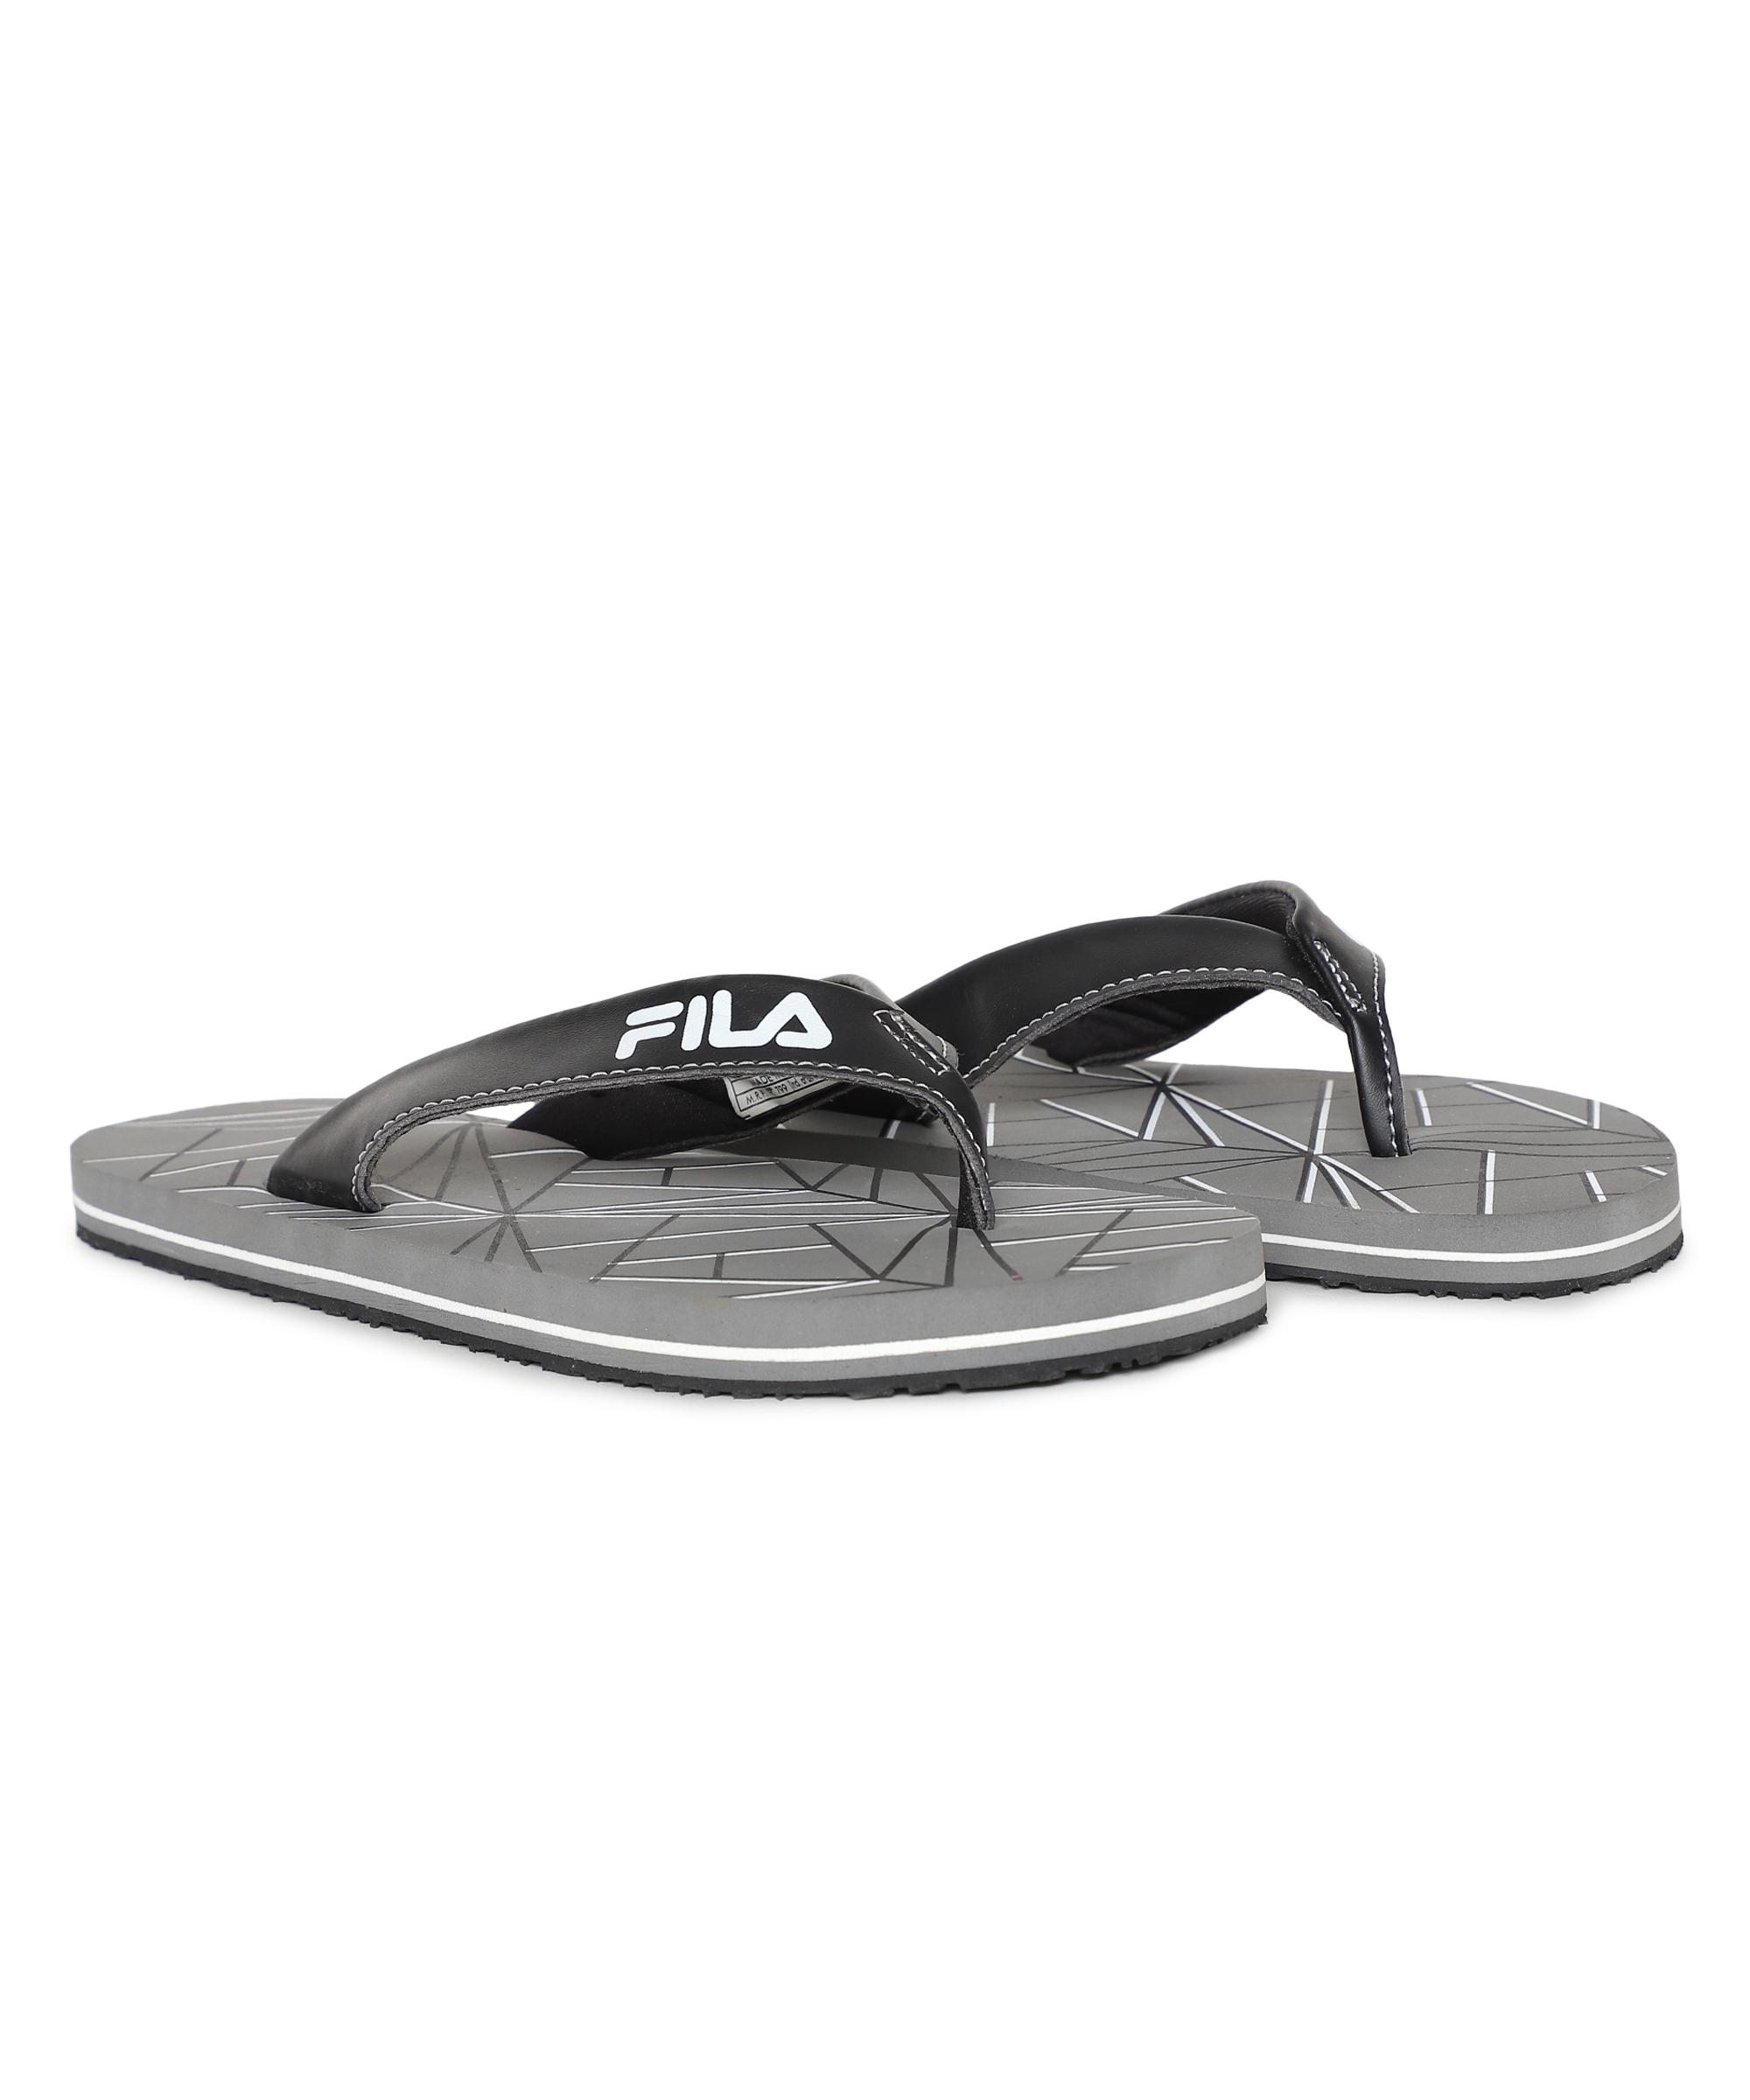 FILA | Grey Casual Lace-ups